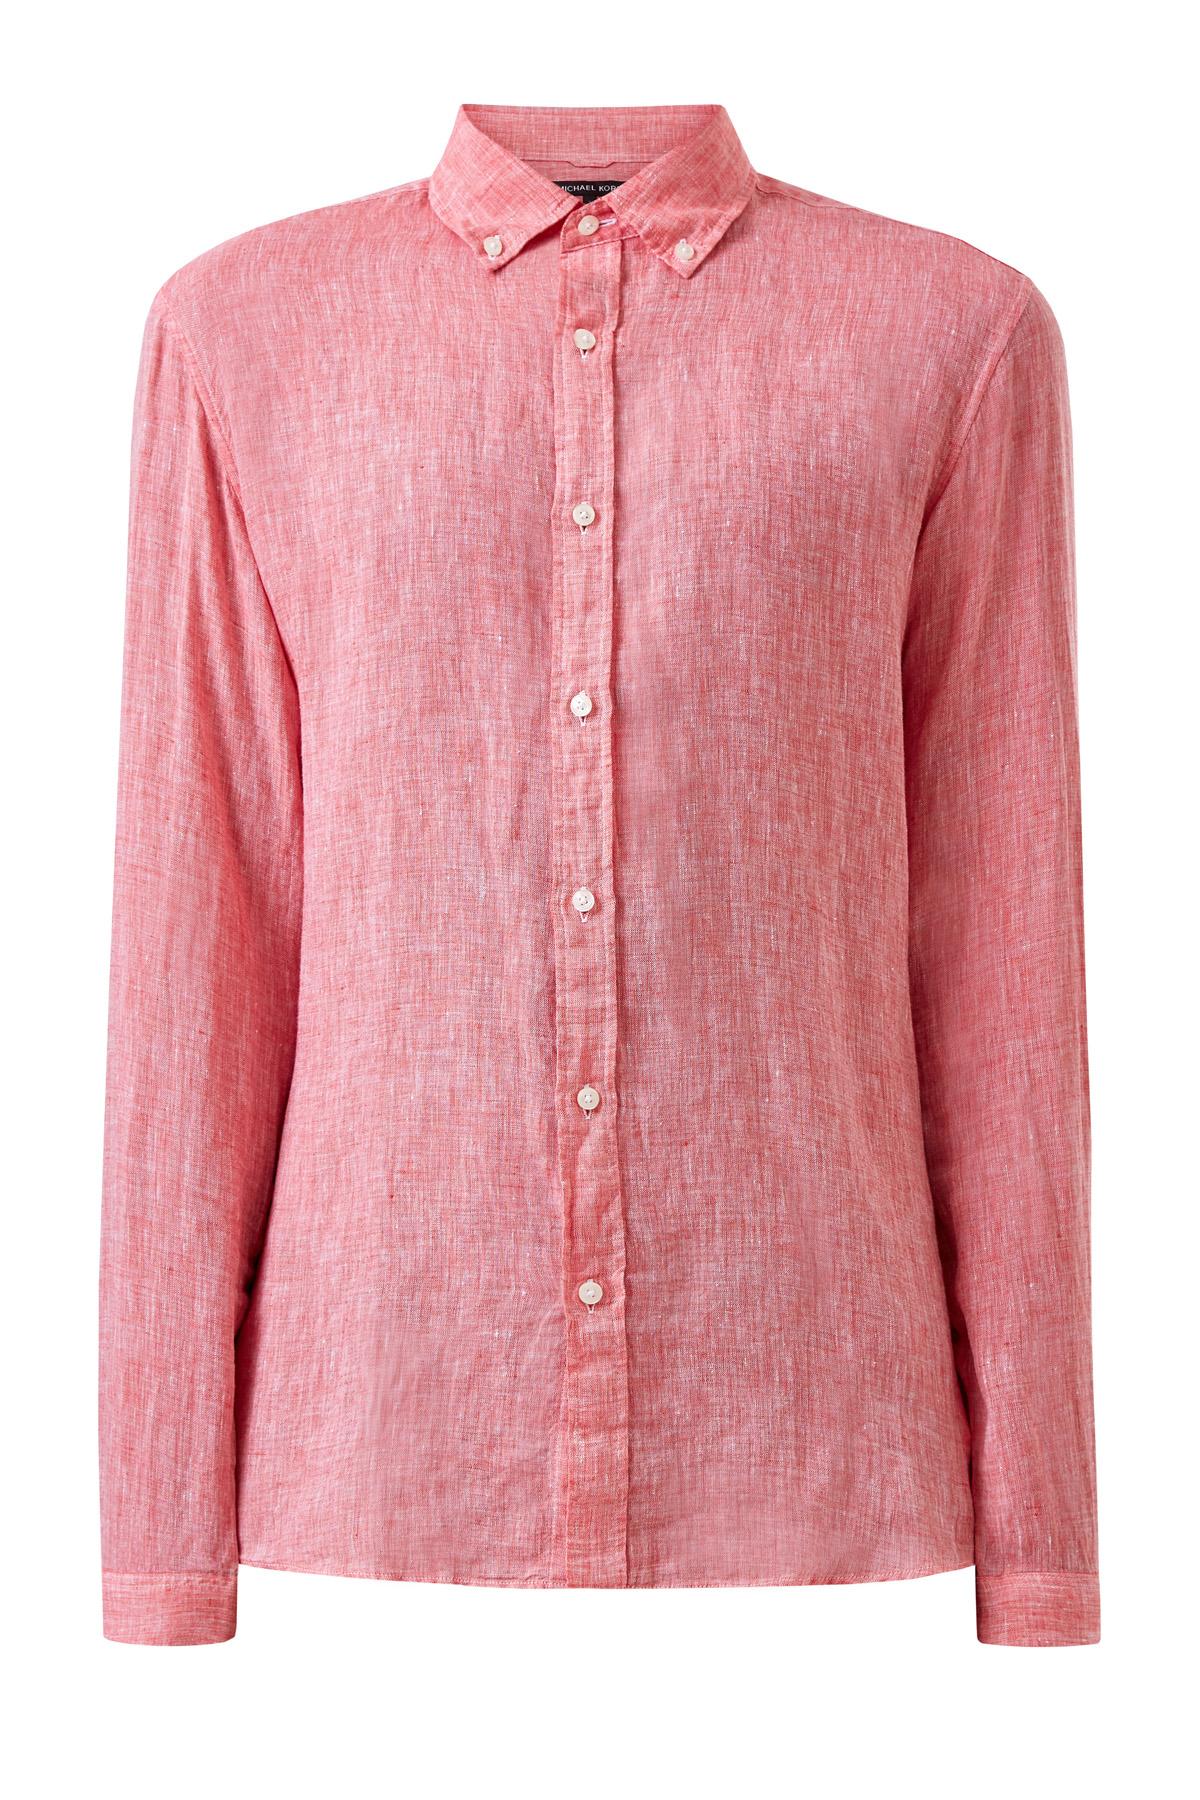 Льняная рубашка Slim Fit с воротником button-down